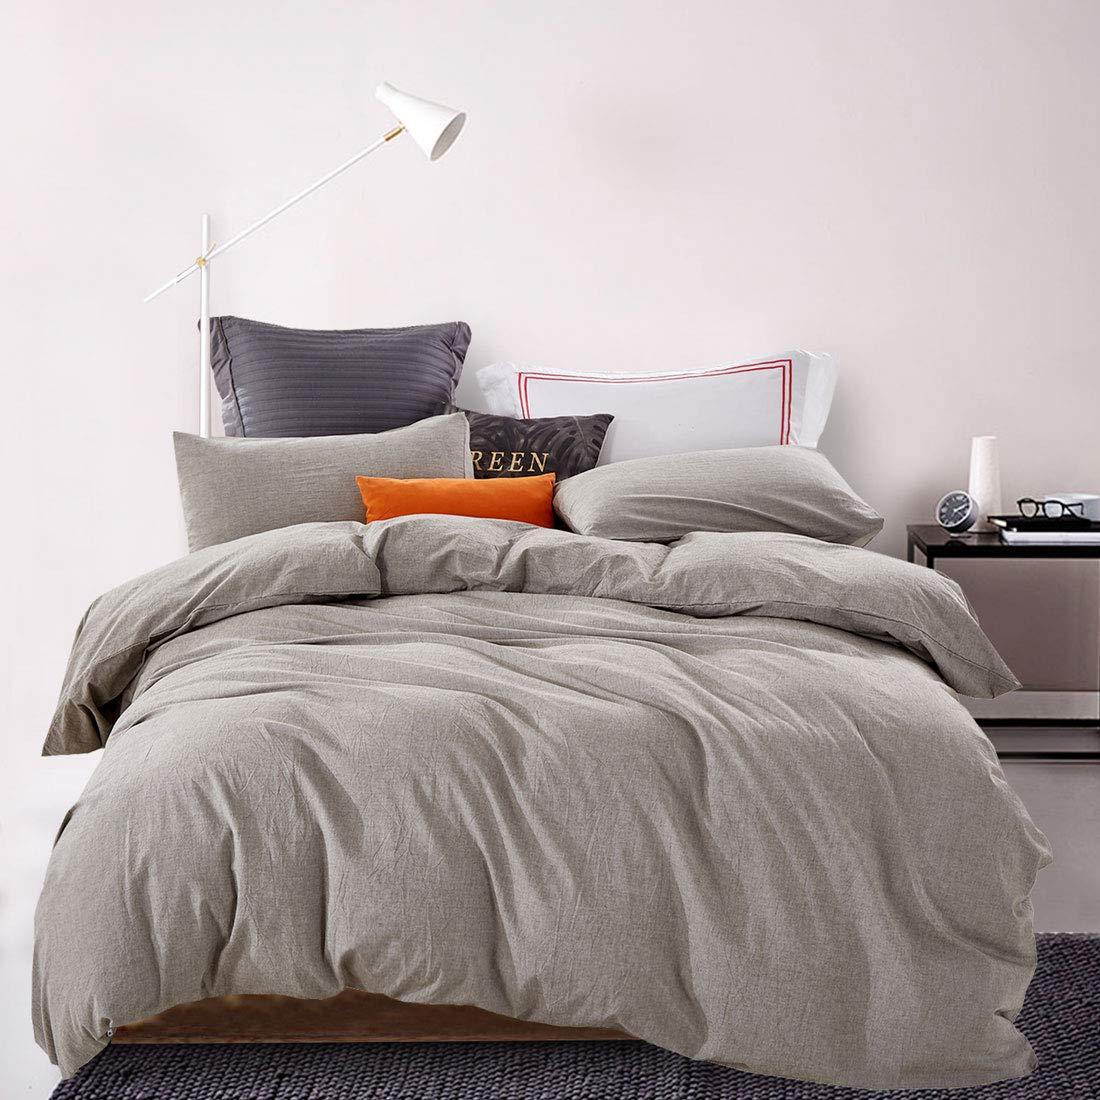 ATsense Duvet Cover Sets, 100% Washed Cotton, Queen 3-Piece Bedding Duvet Cover, Simple Style Farmhouse Bedding Set (Grey 7063)